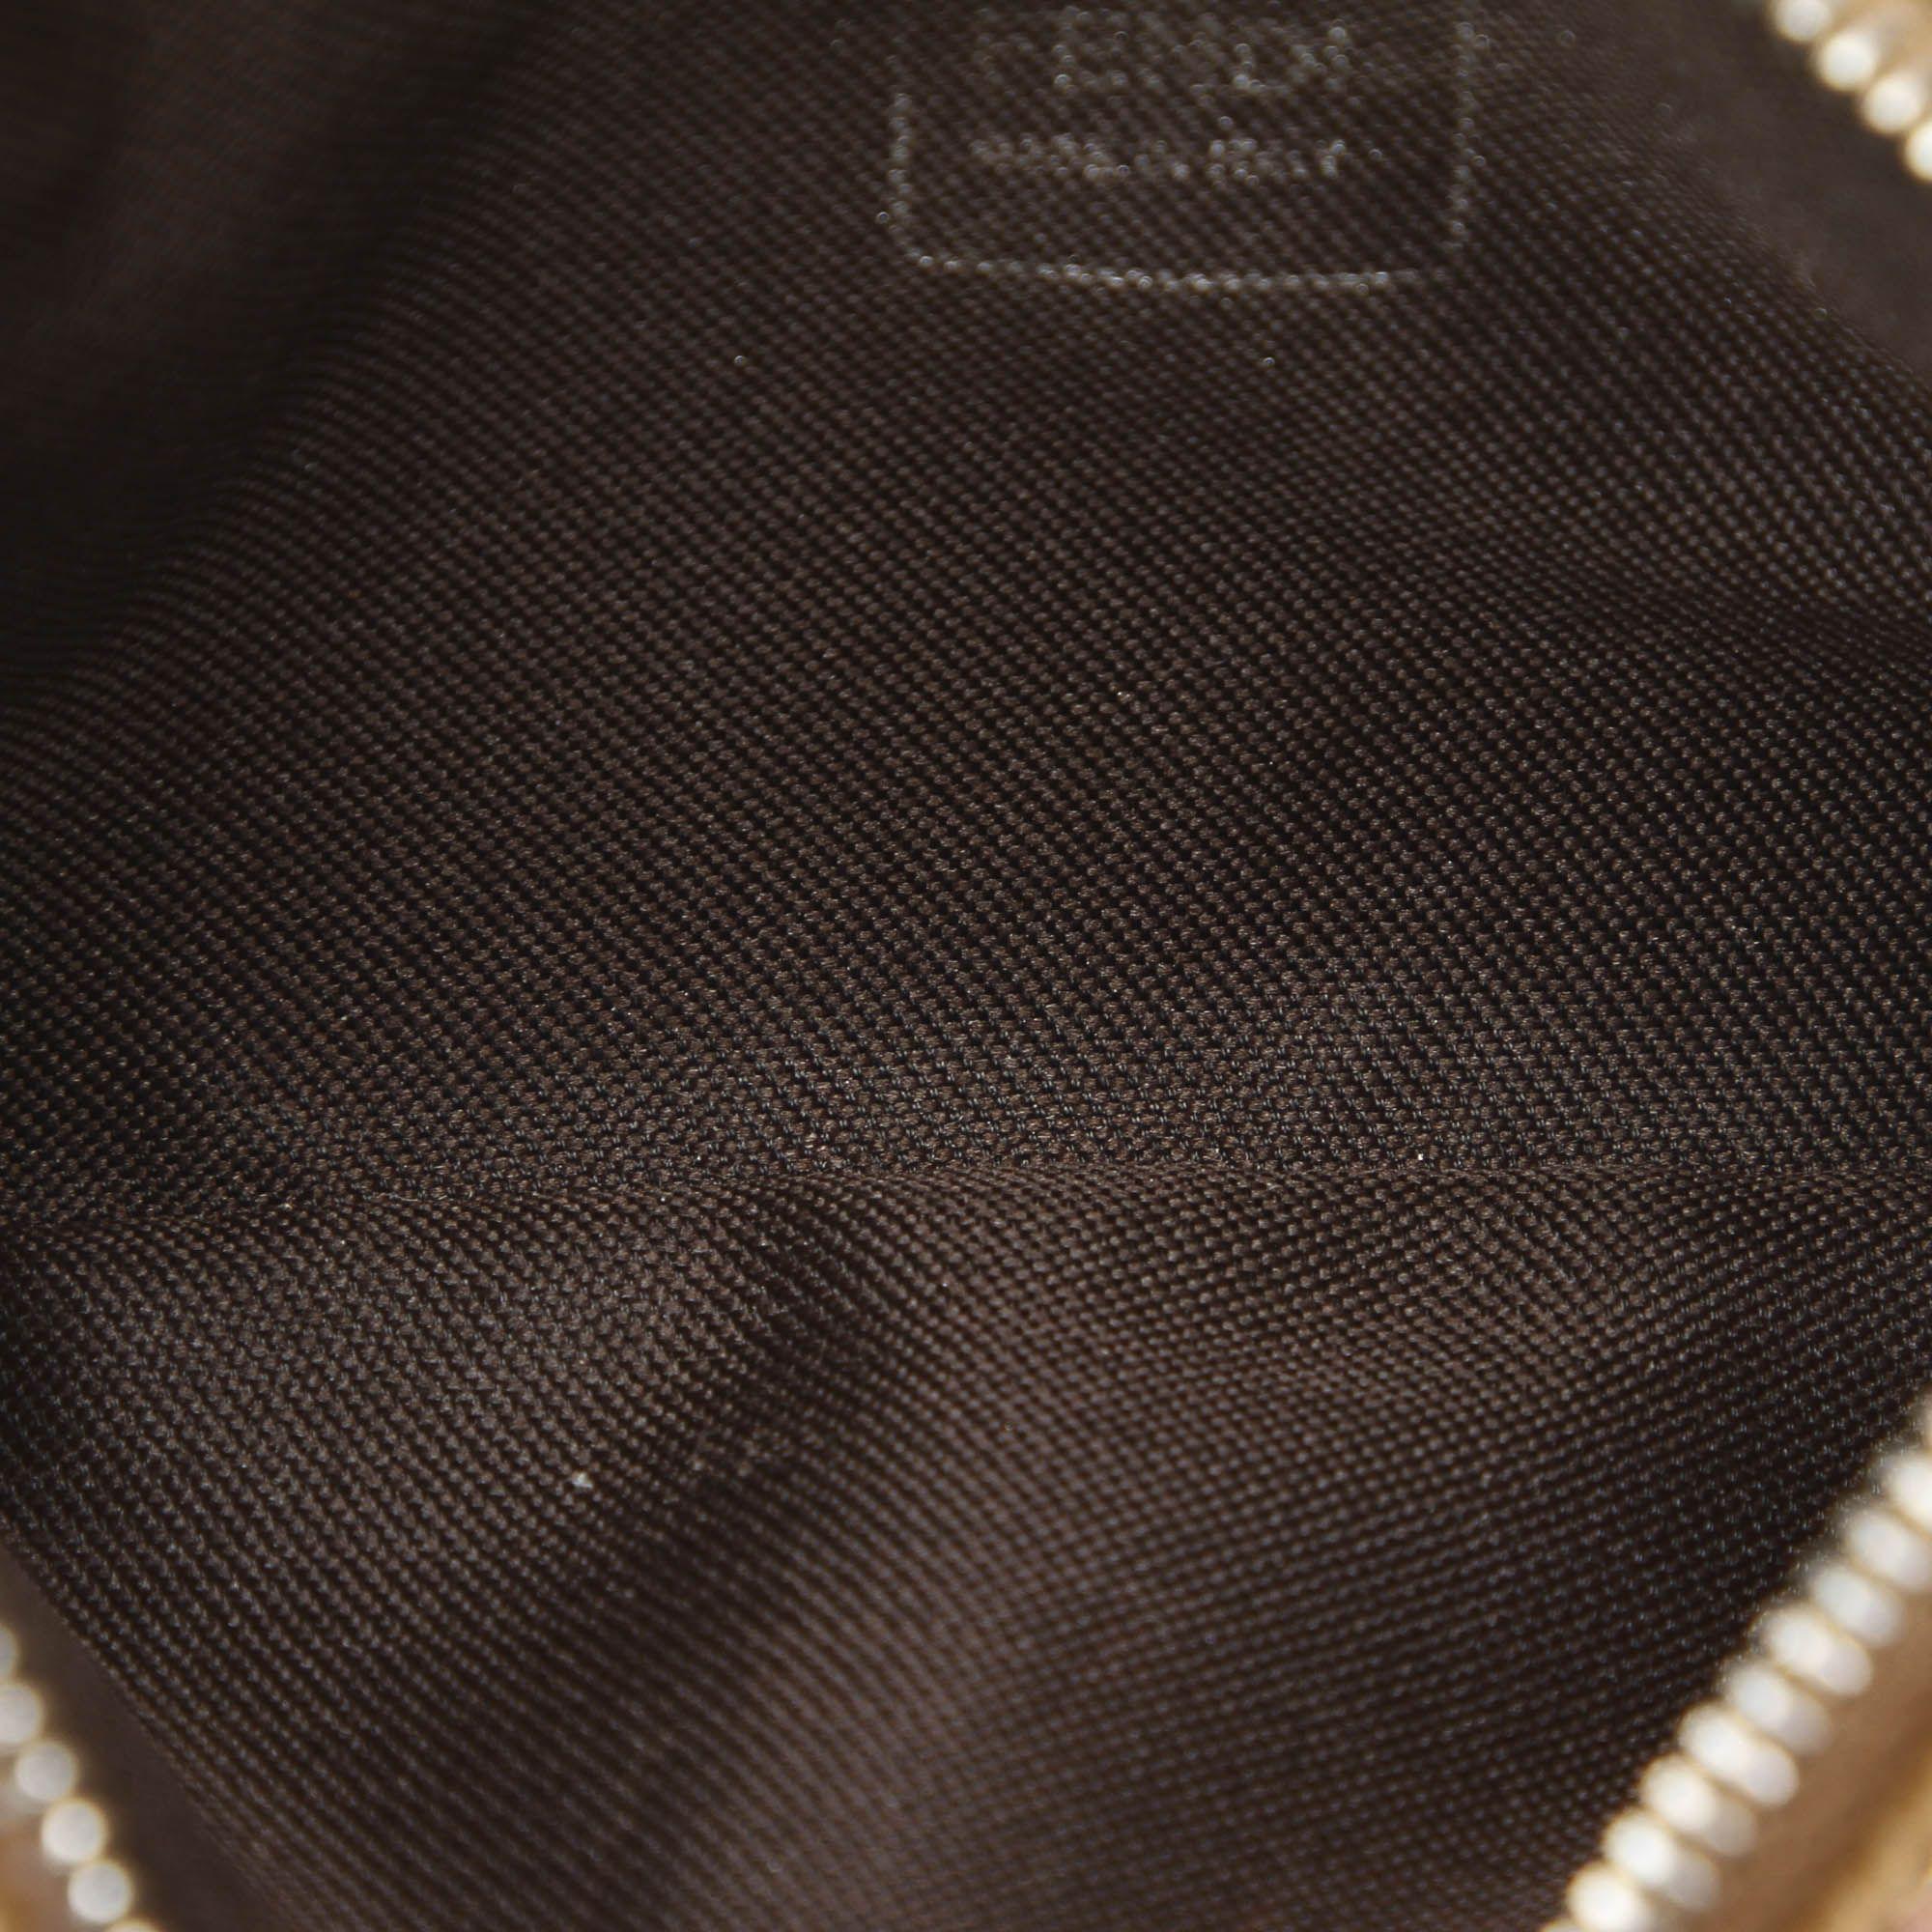 Vintage Fendi Corduroy Coin Pouch Brown